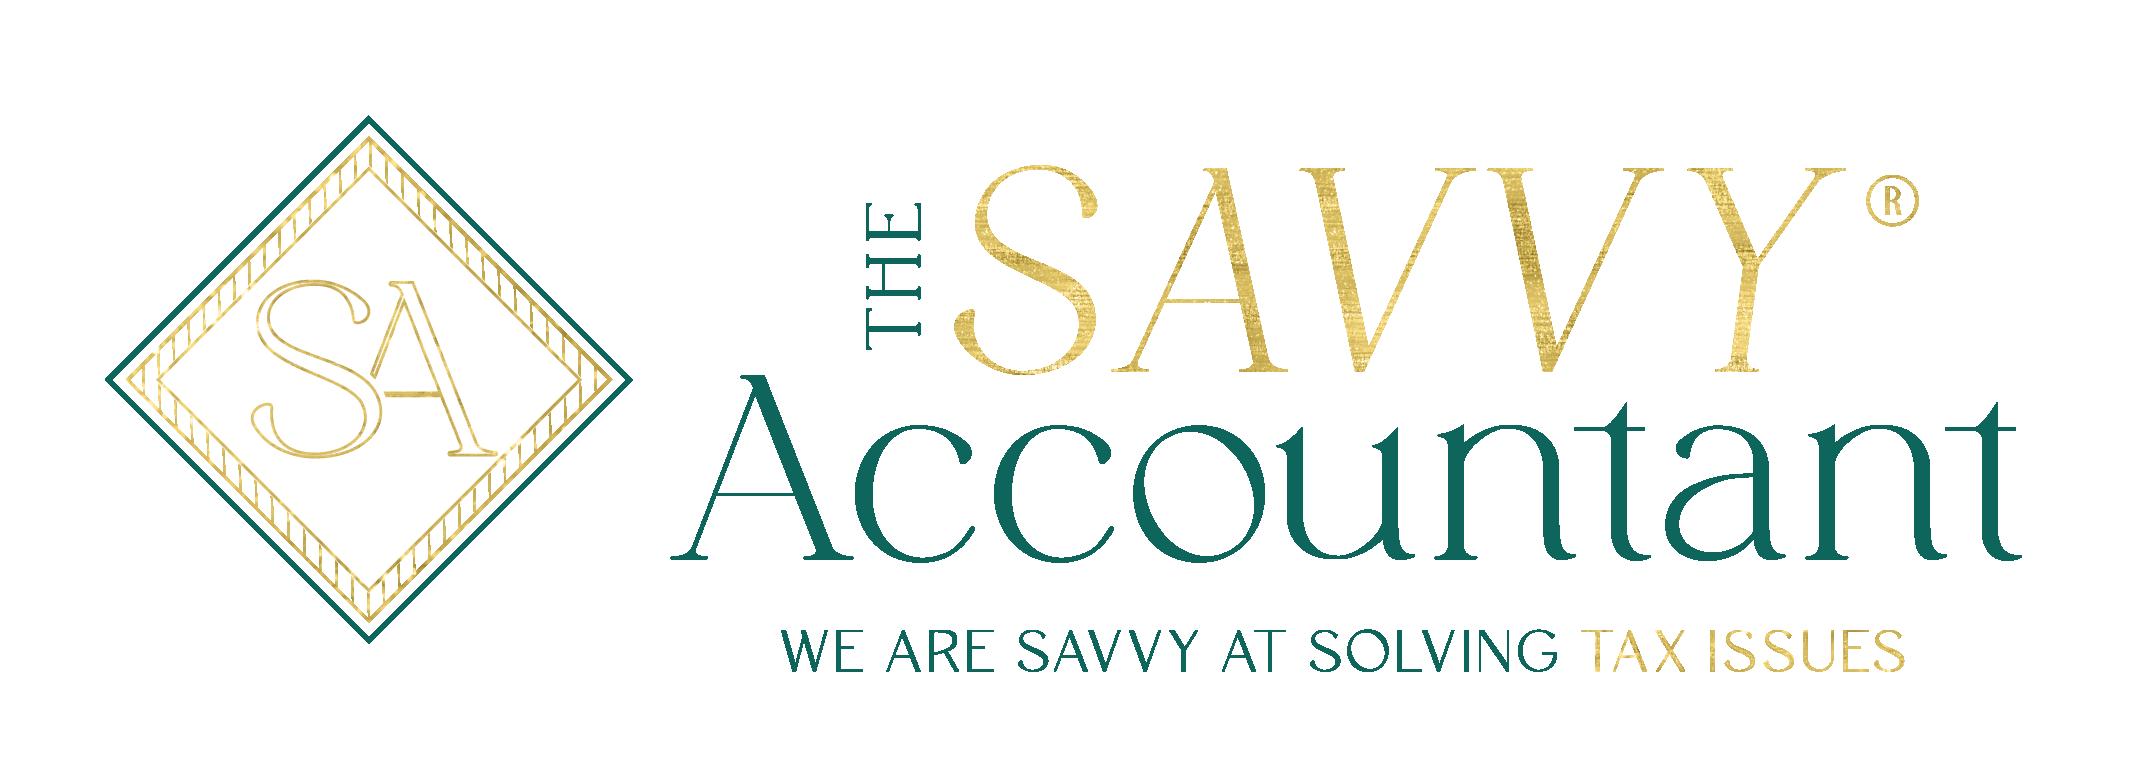 The Savvy Accountant™